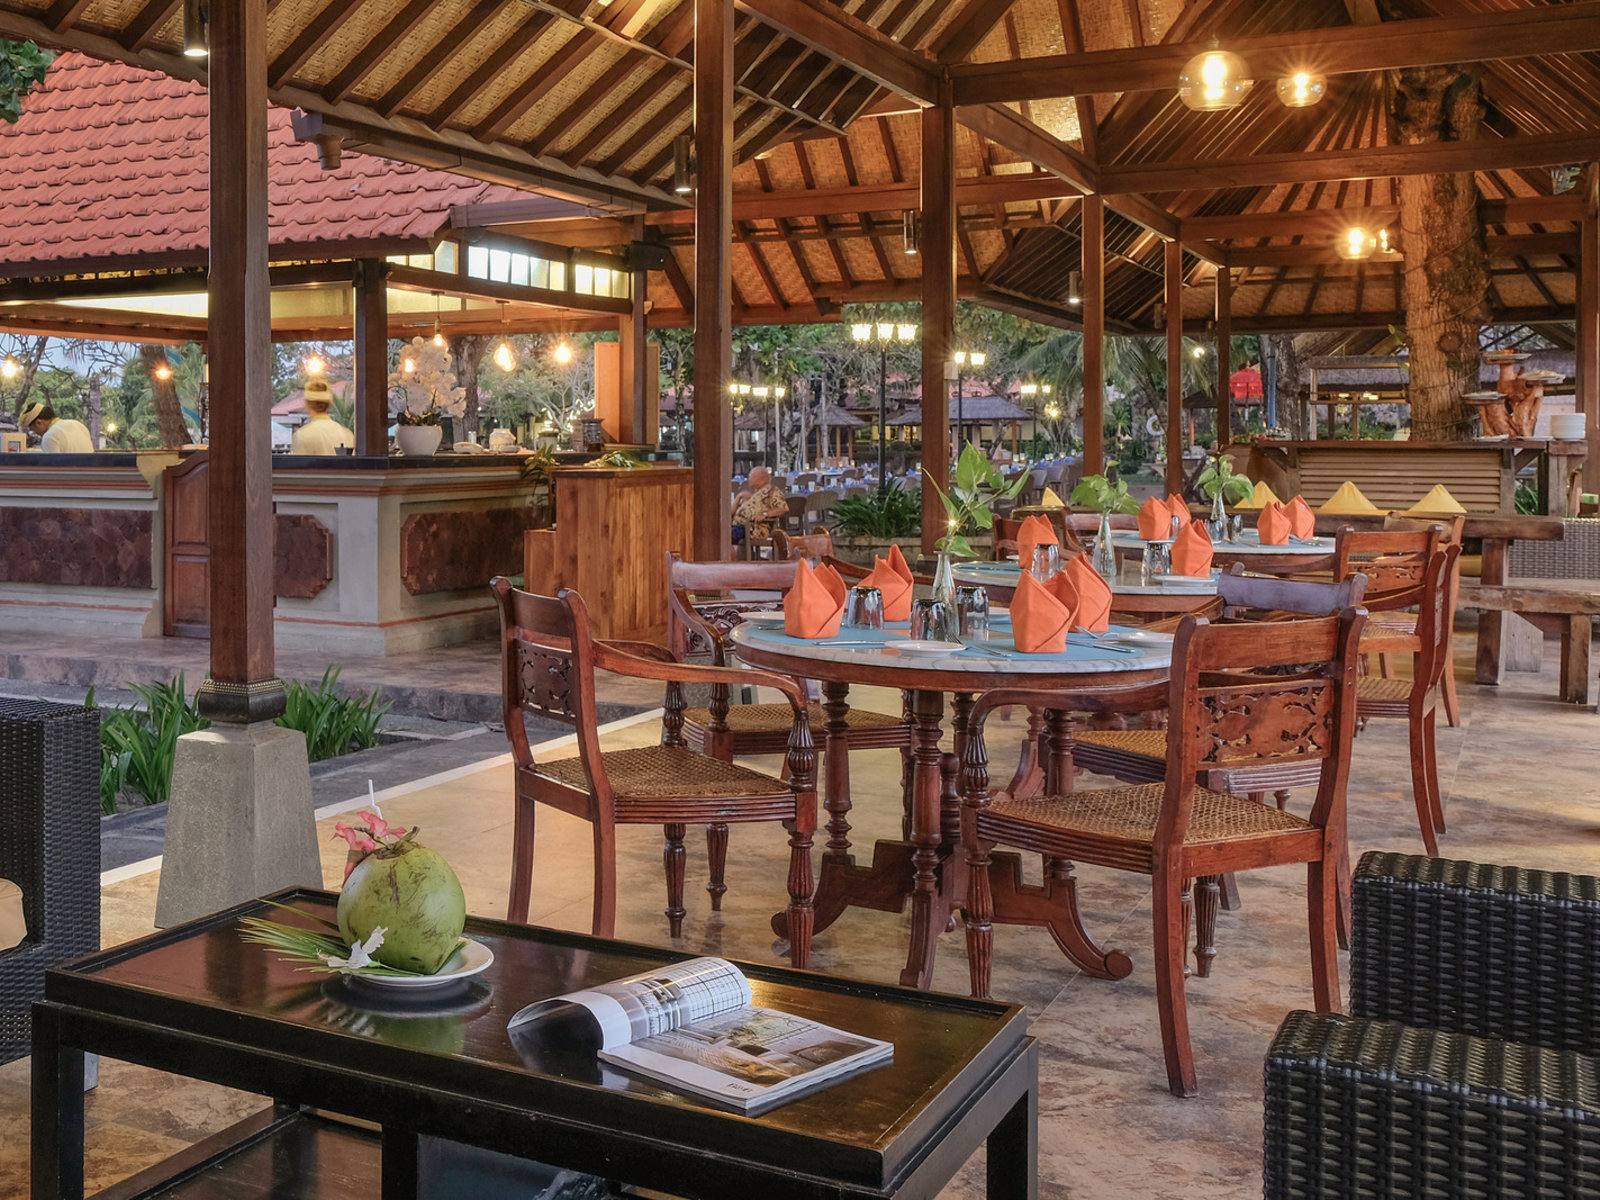 Ratna Restaurant